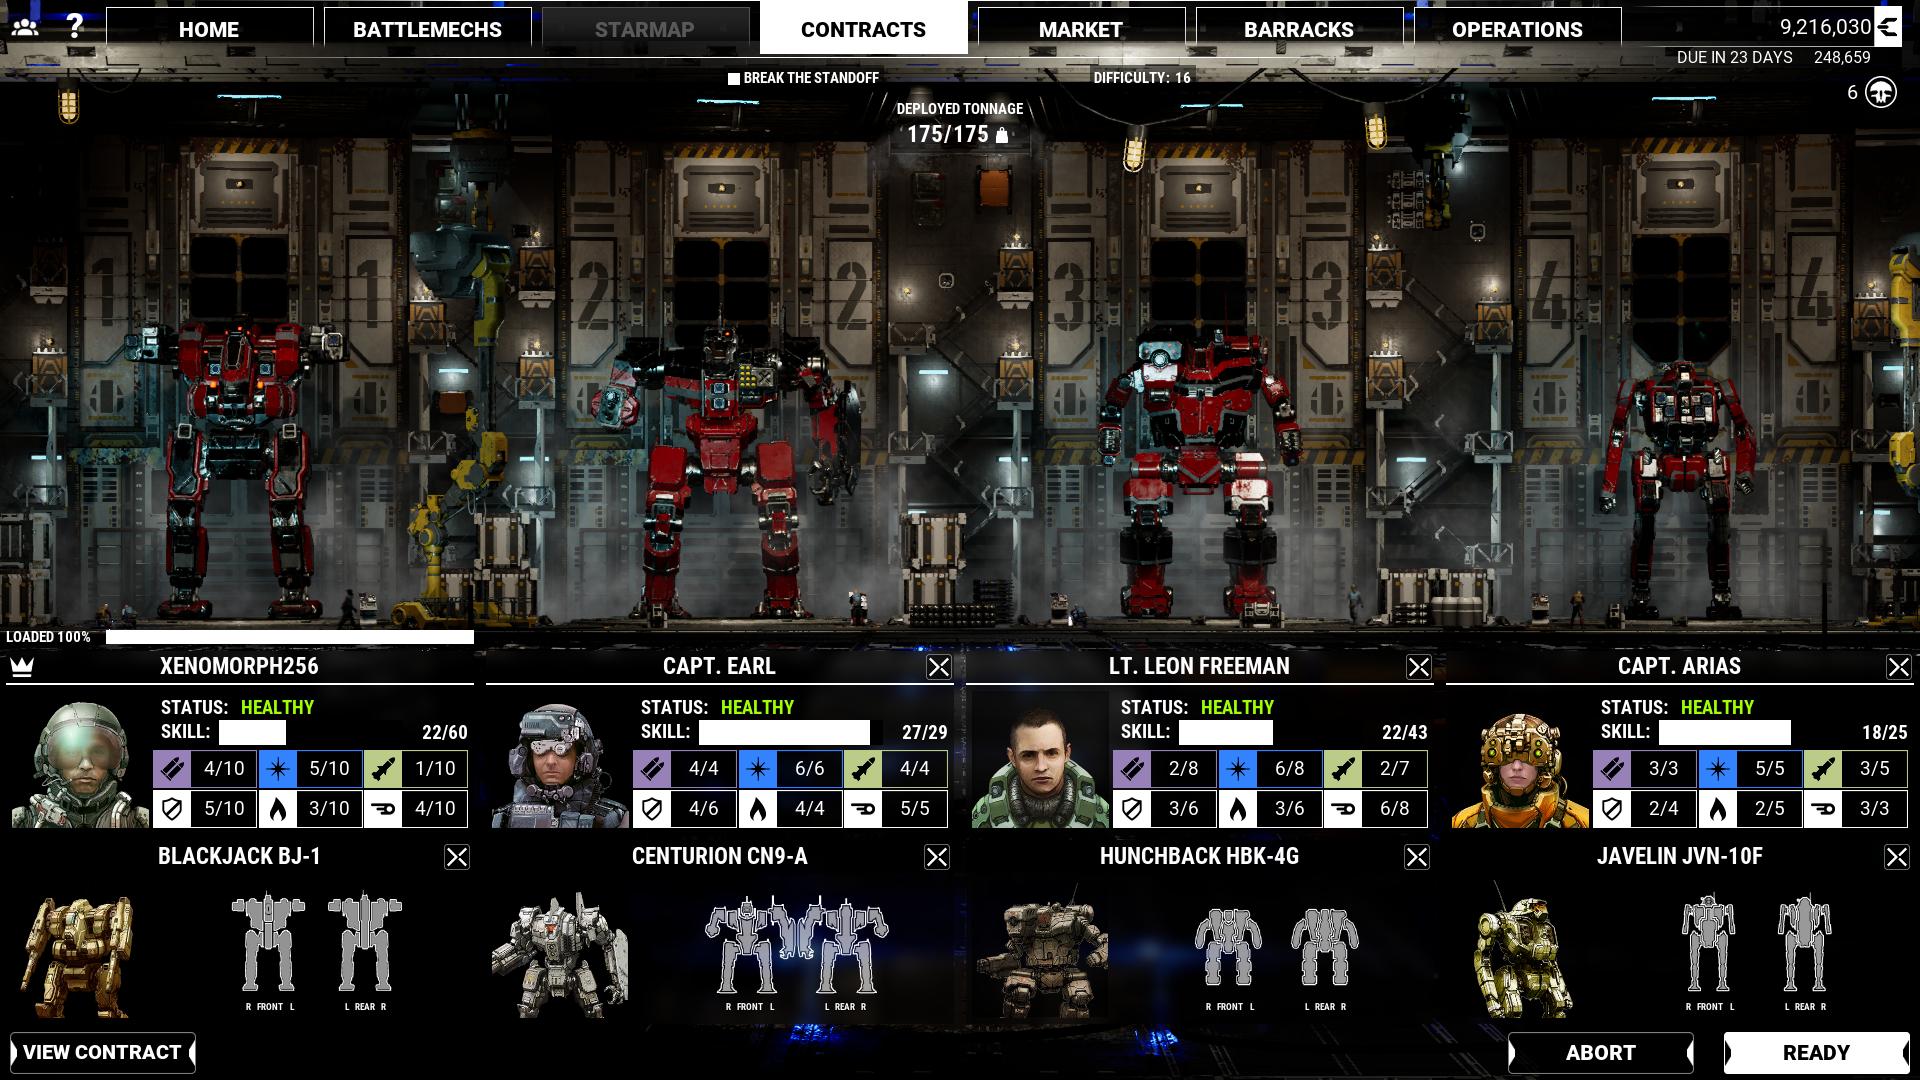 Mechwarrior 5  Mercenaries Screenshot 2019.12.12 - 22.36.25.46.png